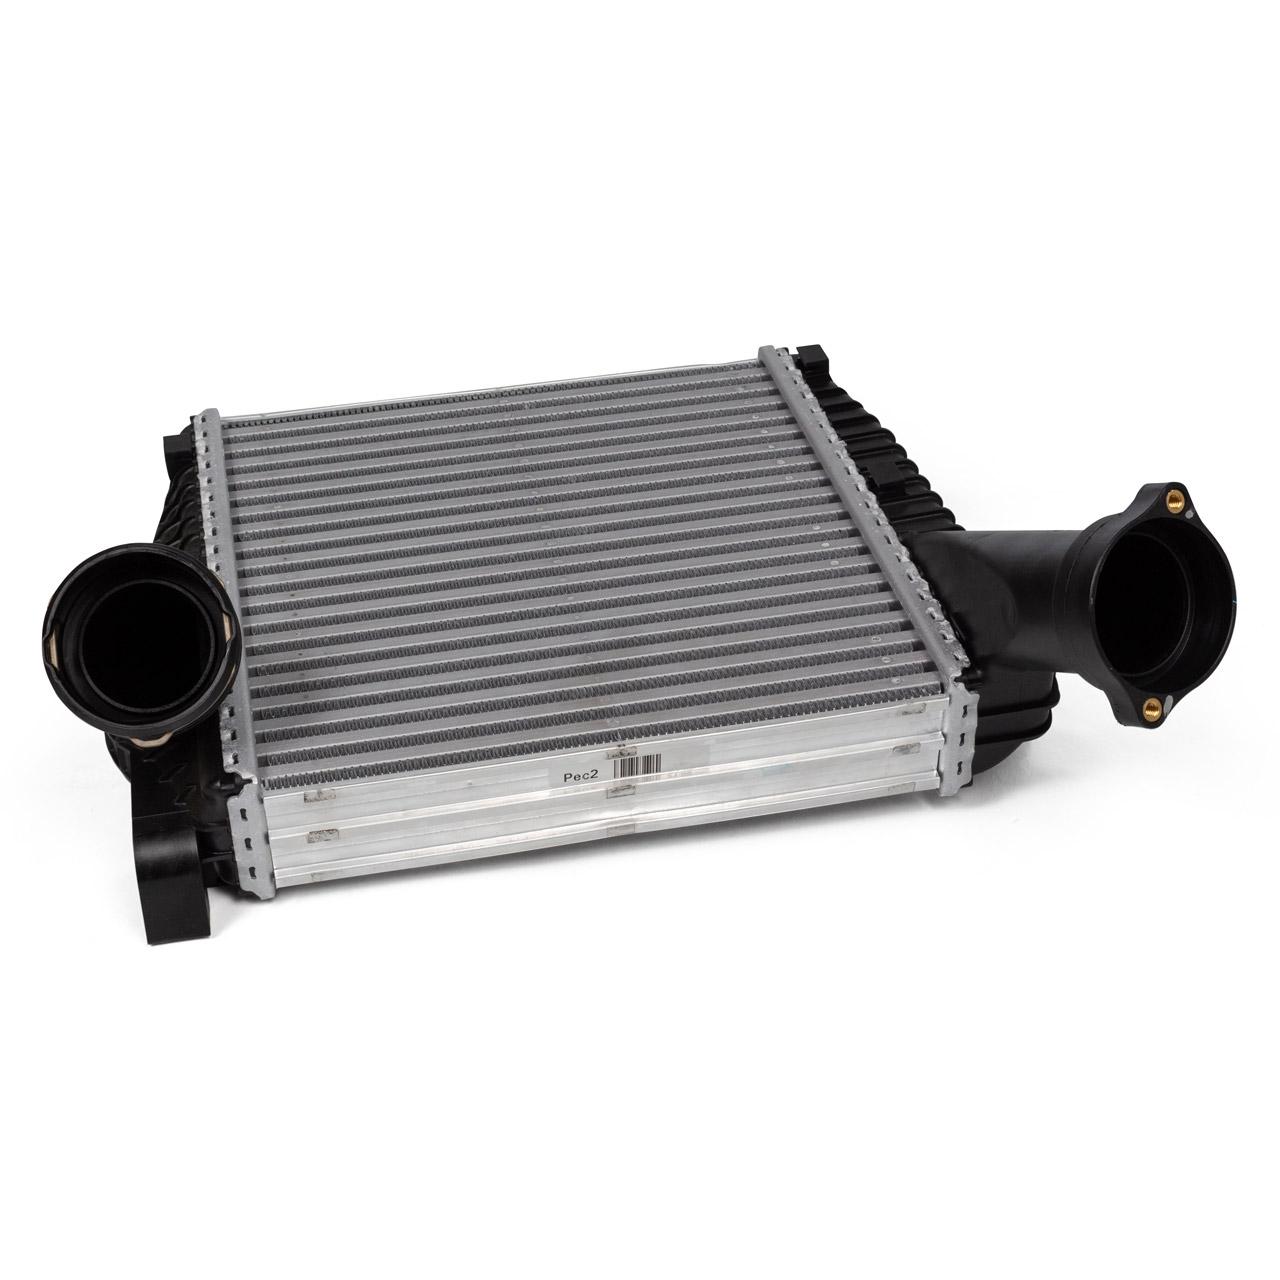 HELLA Ladeluftkühler PORSCHE Cayenne (9PA) Turbo / Turbo S 4.5 VW Touareg (7L) links